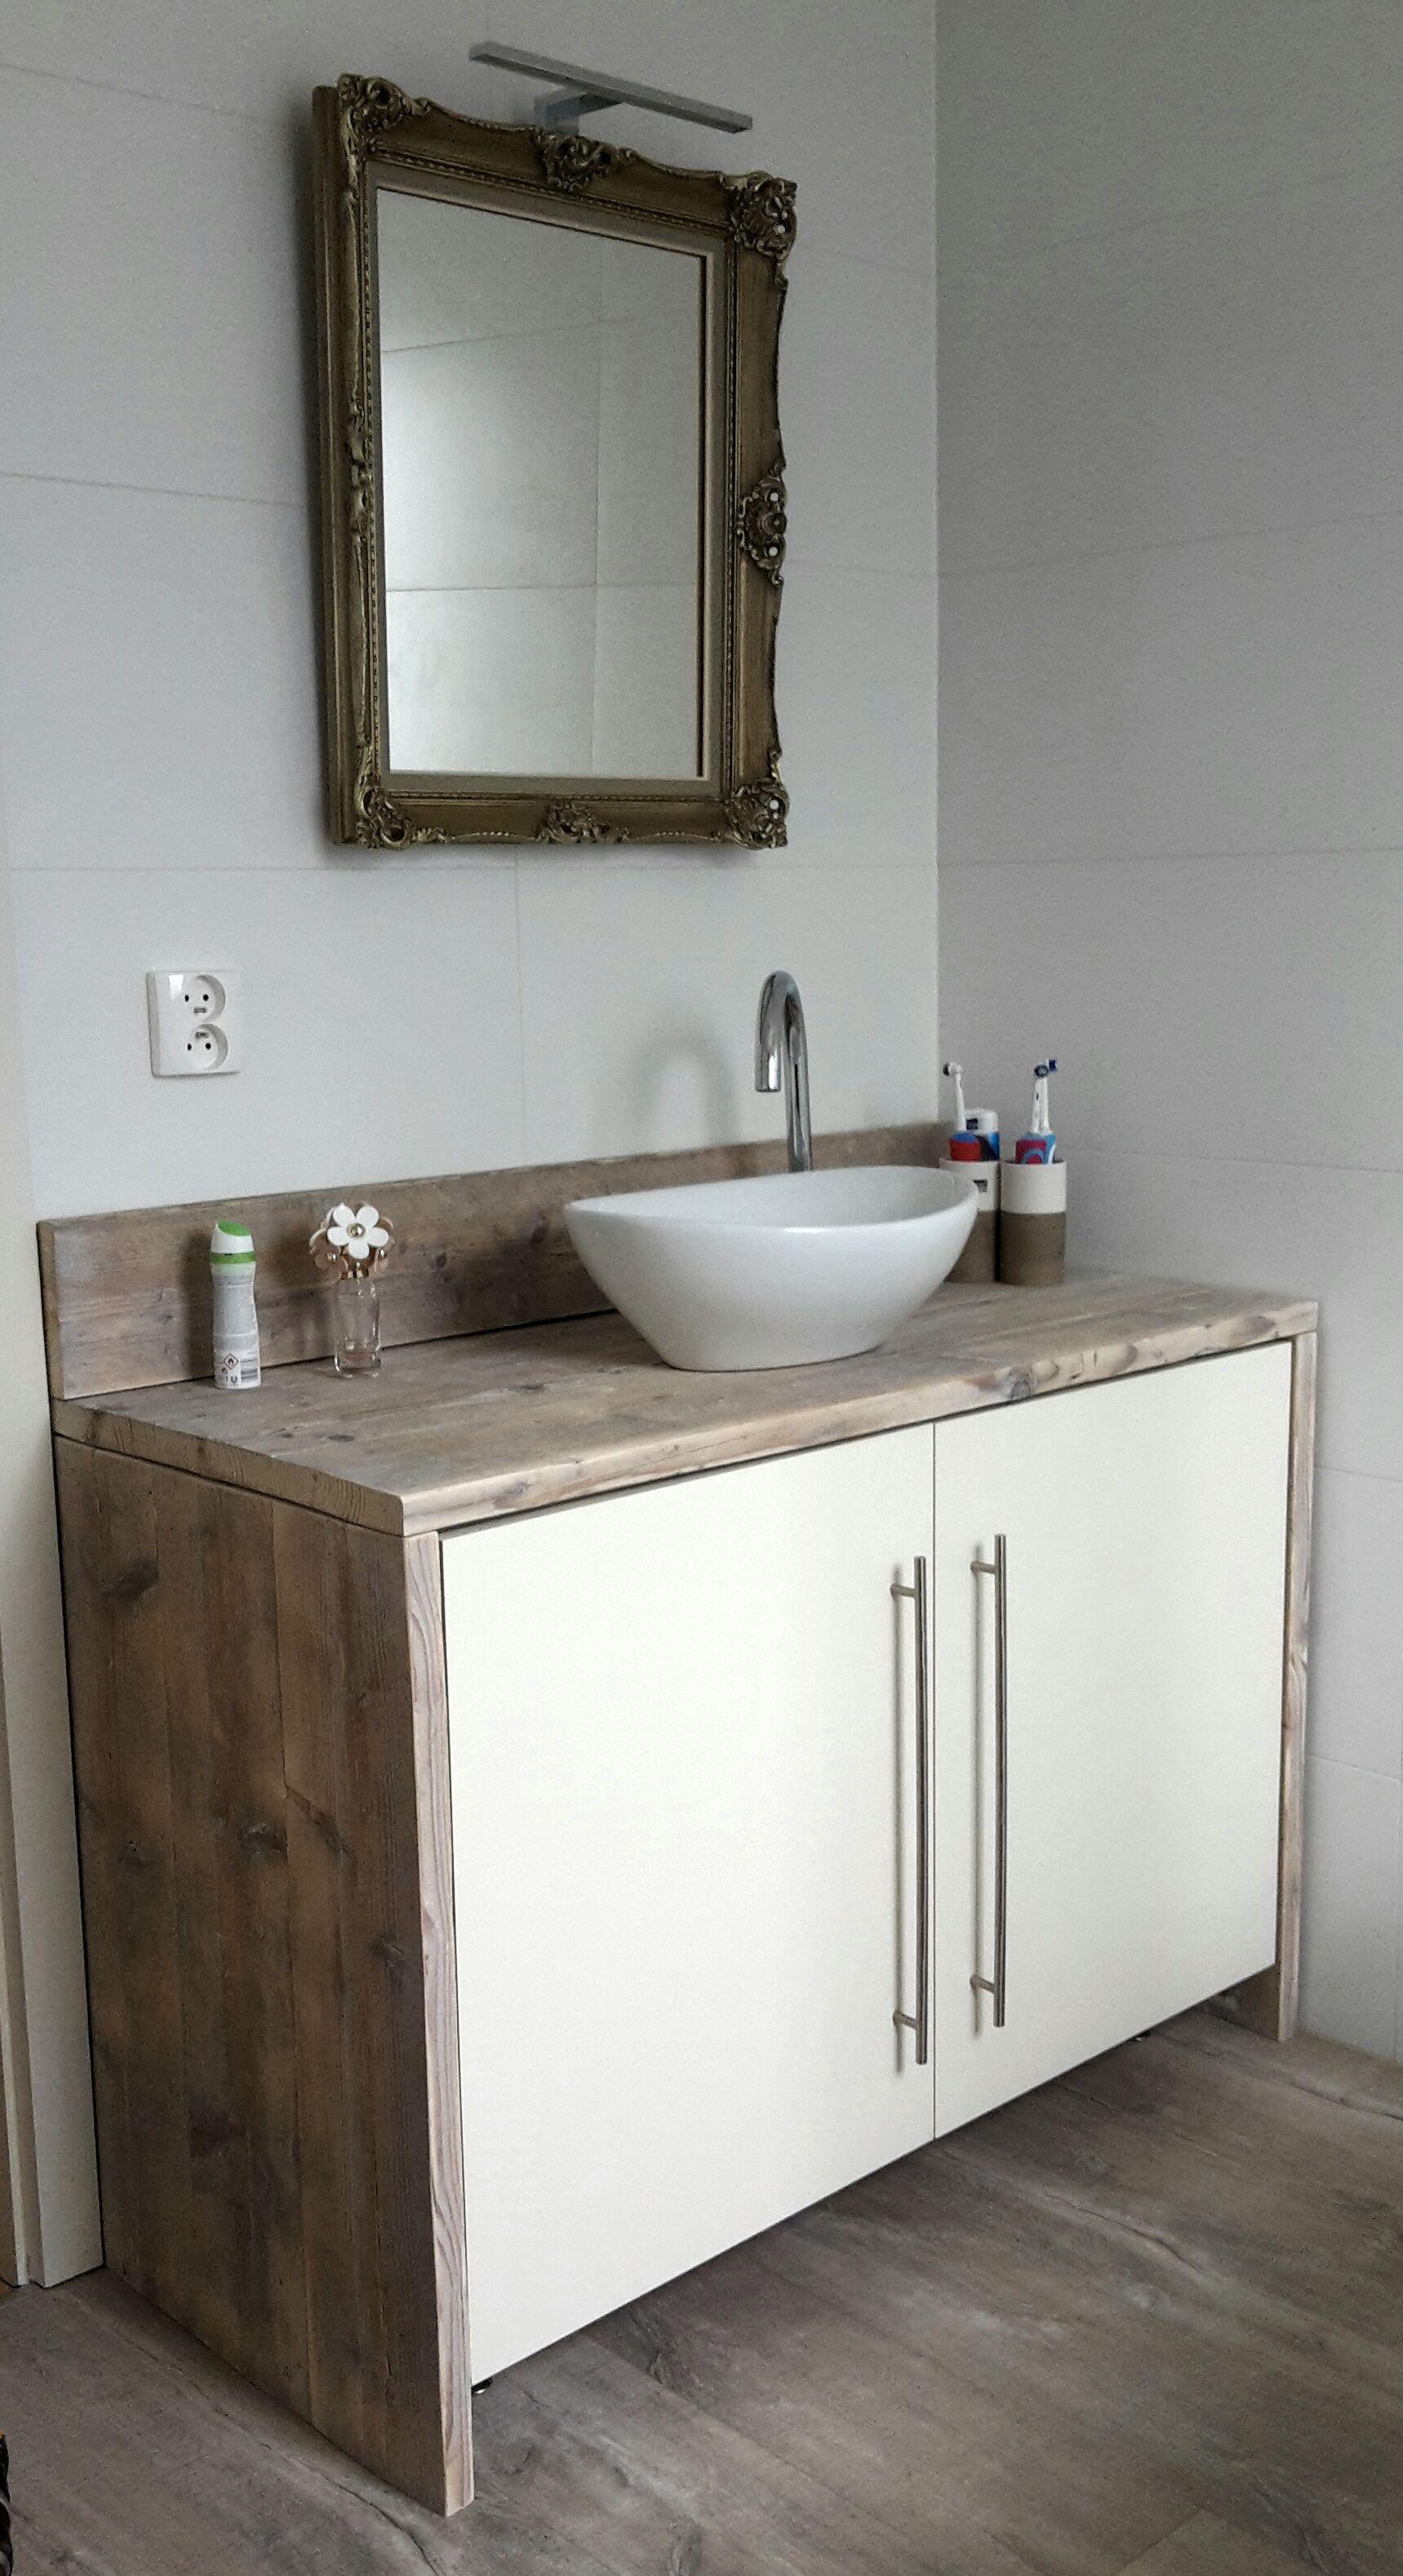 Badkamermeubel uit gebruikt steigerhout en spiegel met LED ...